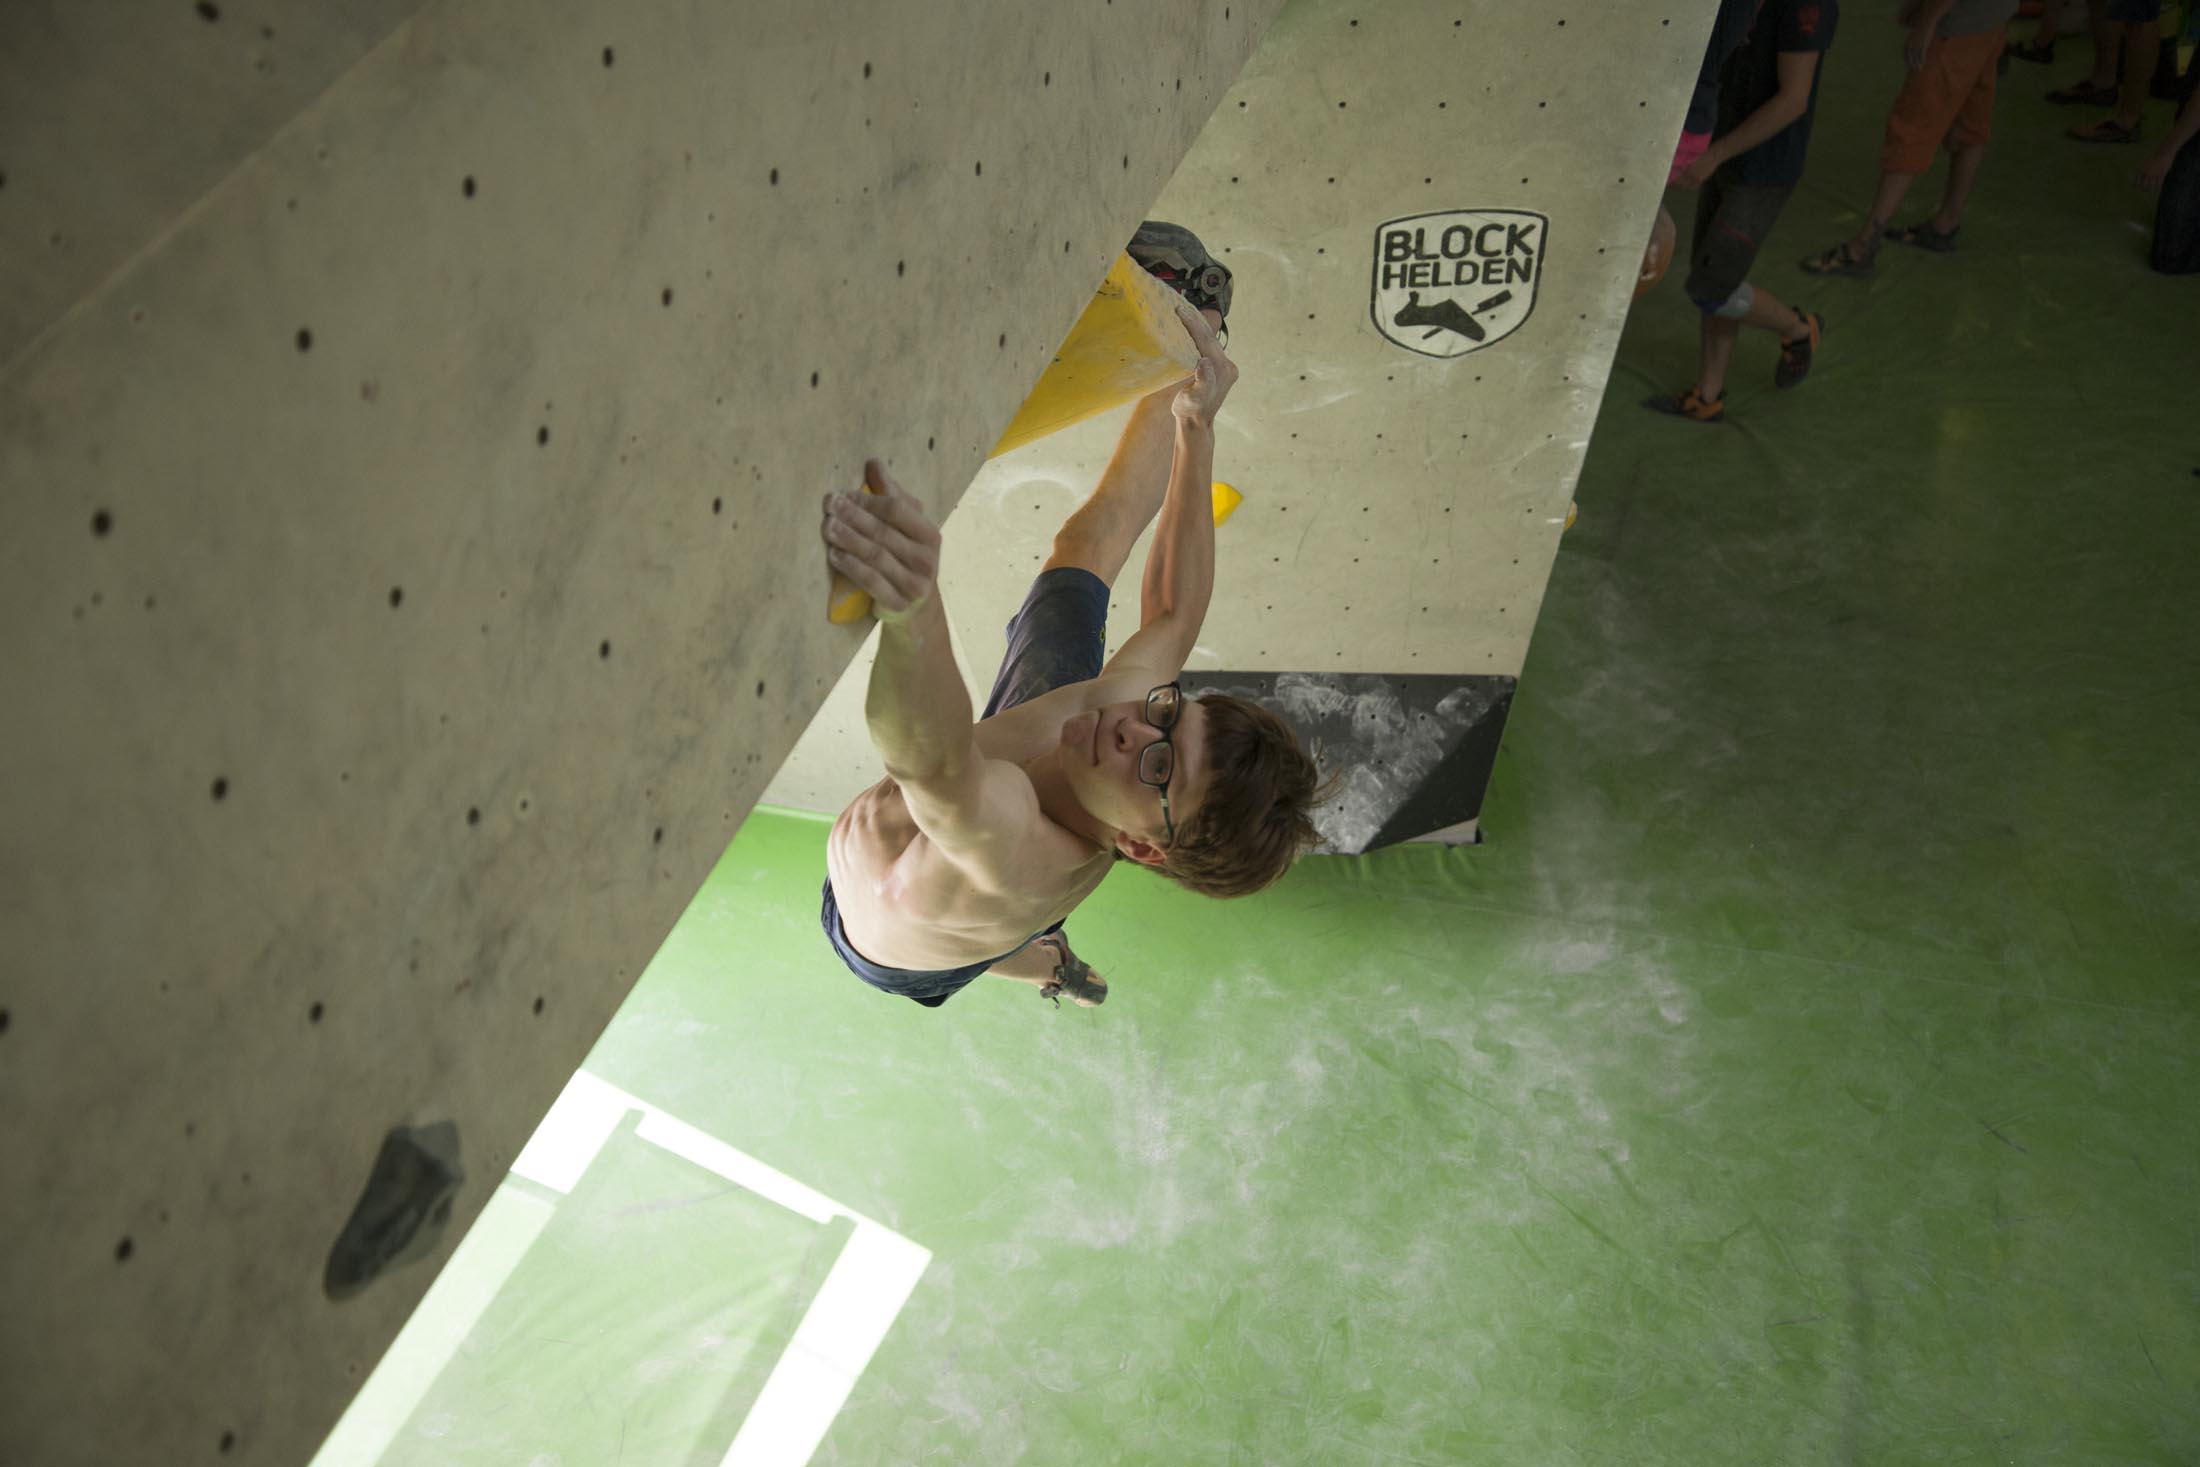 Quali, internationaler bouldercup Frankenjura 2016, BLOCKHELDEN Erlangen, Mammut, Bergfreunde.de, Boulderwettkampf07092016319